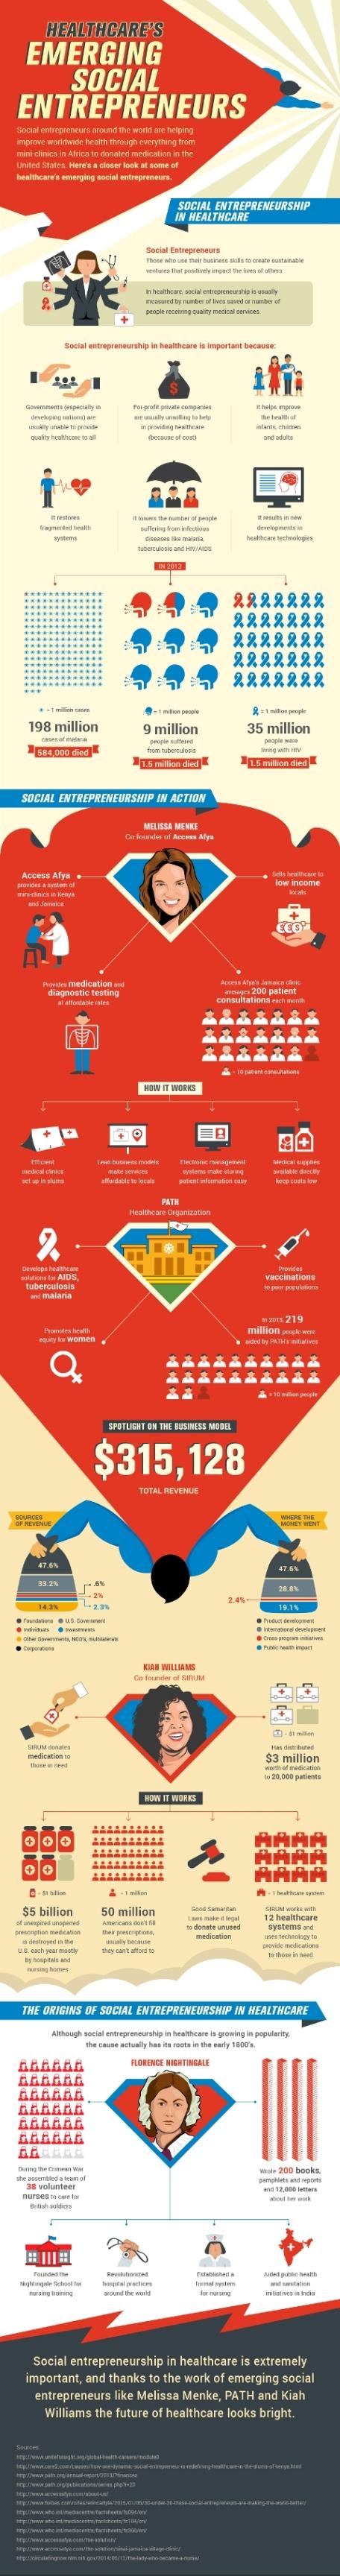 CS-GW_Healthcare-Social-Entrepreneurs_D1e_APR03